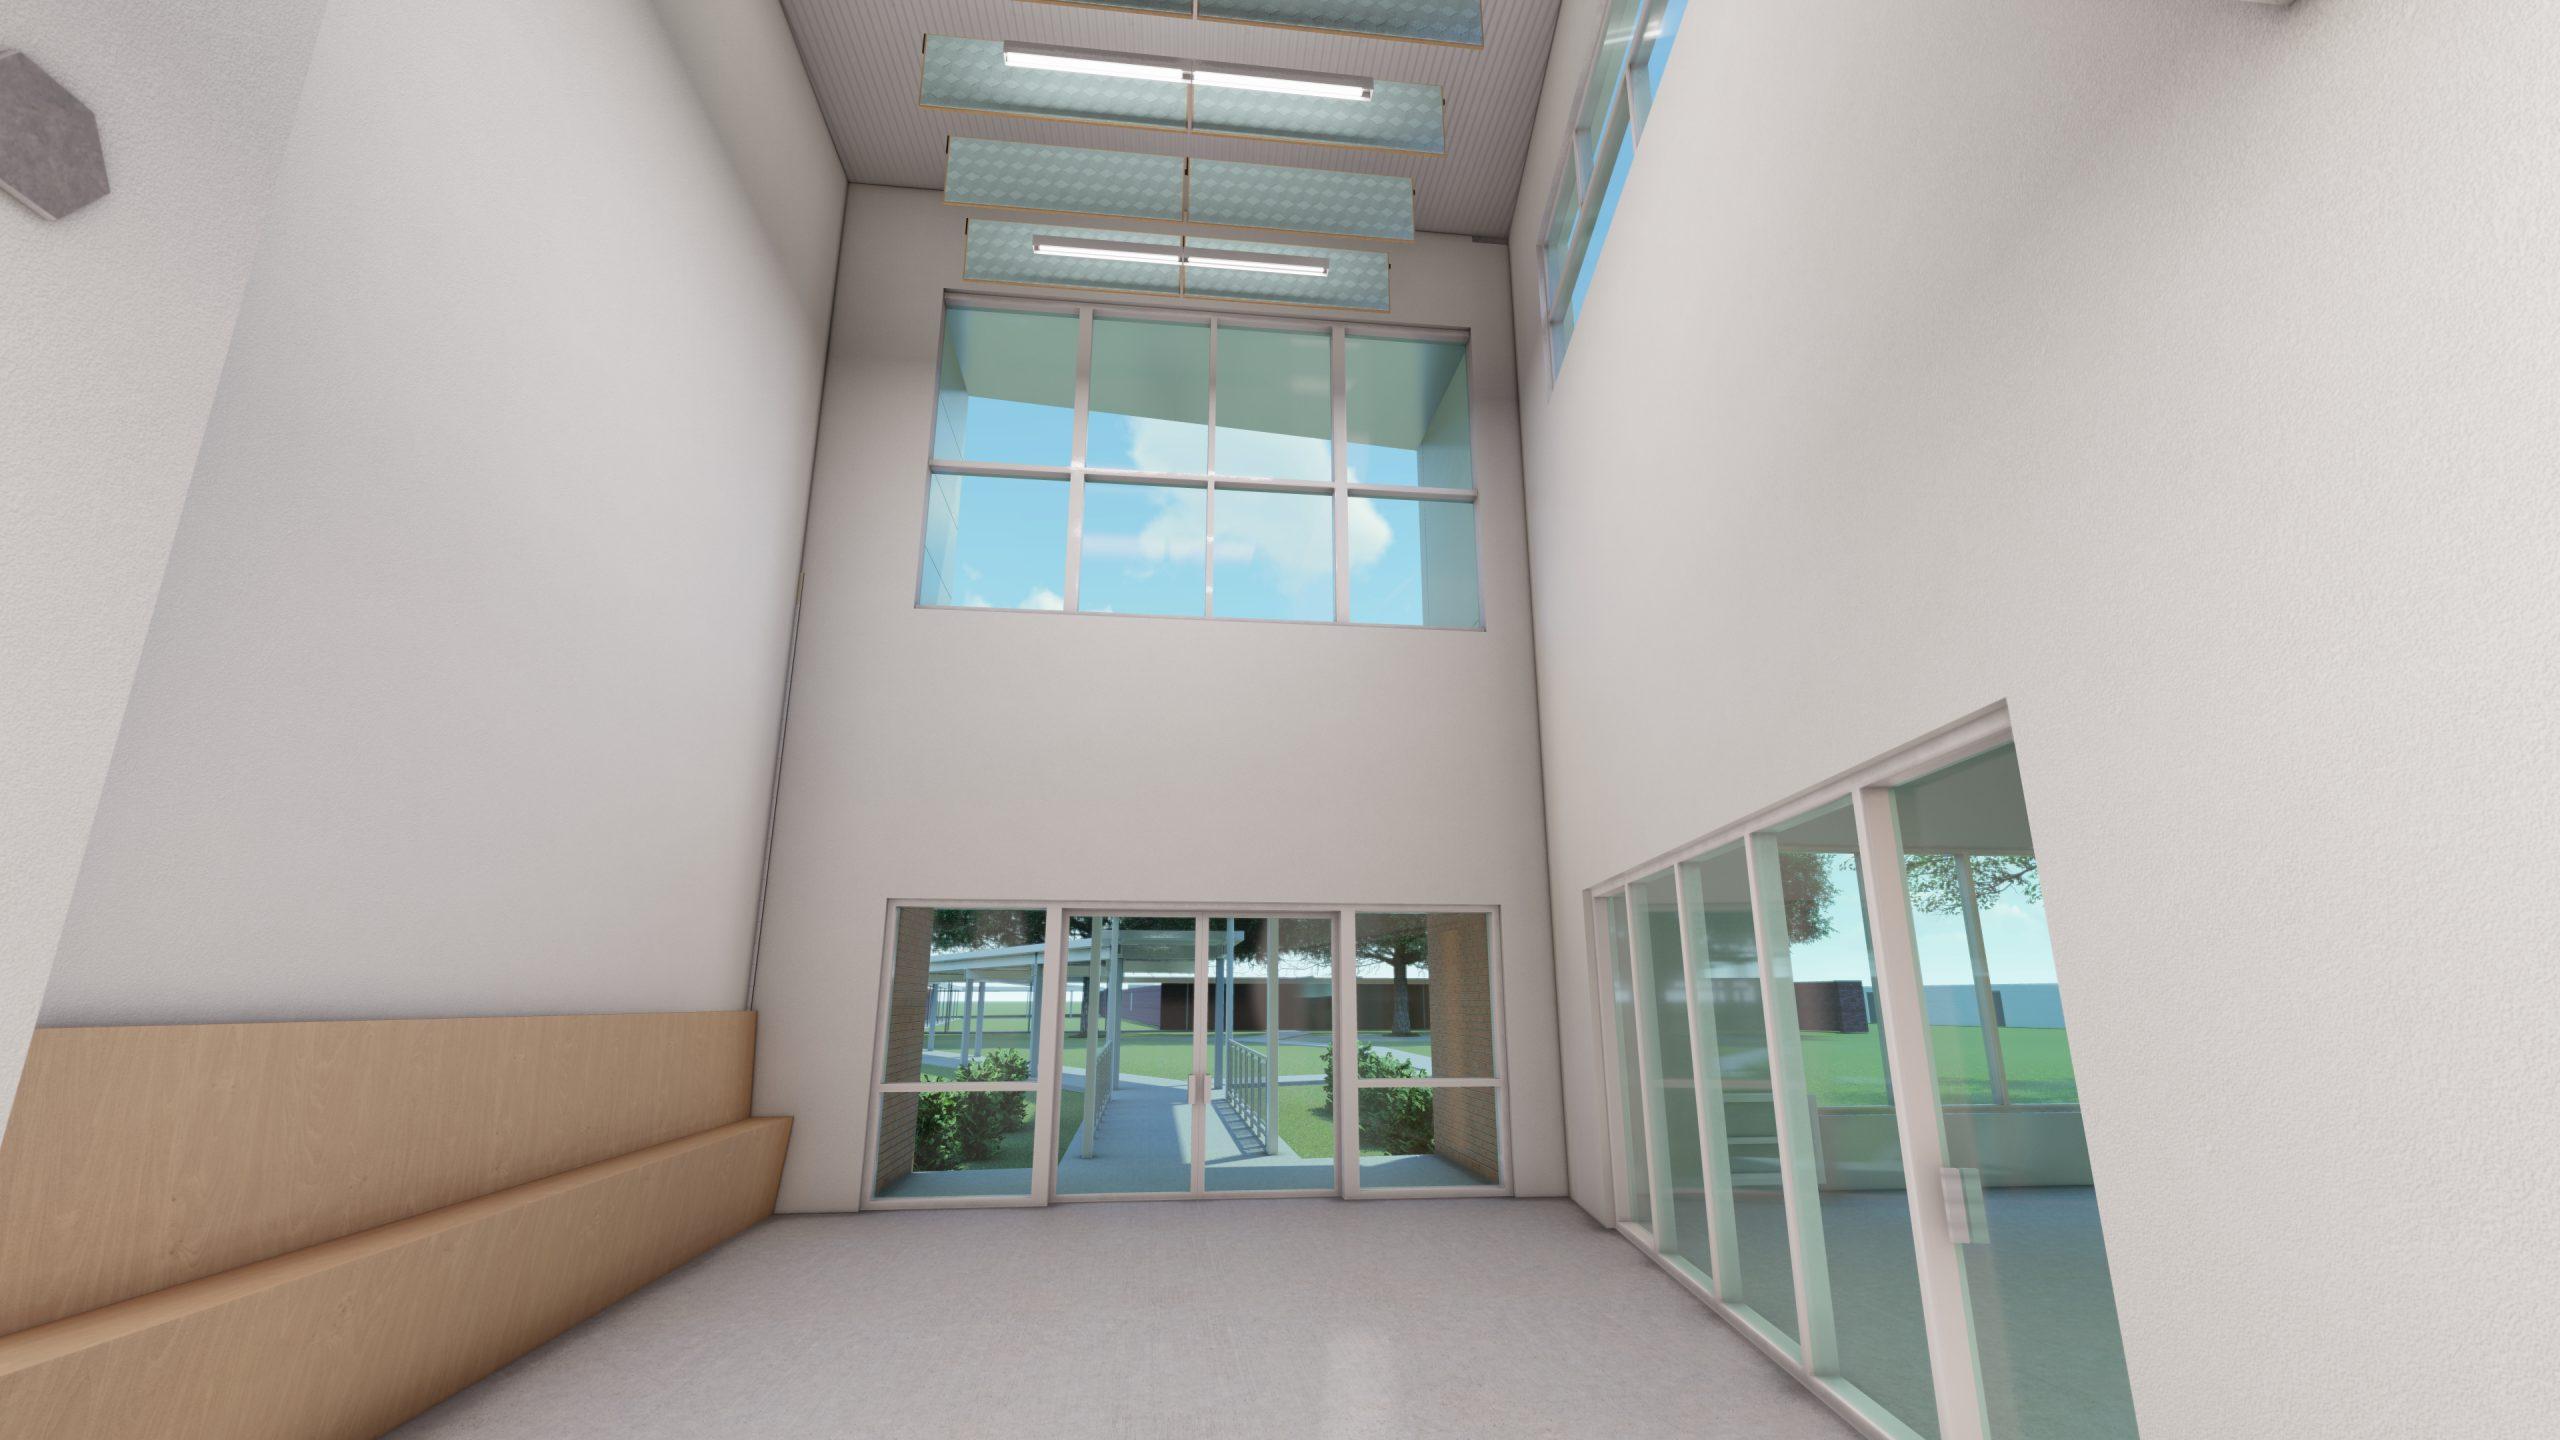 New Music Room_10 - Lobby 4